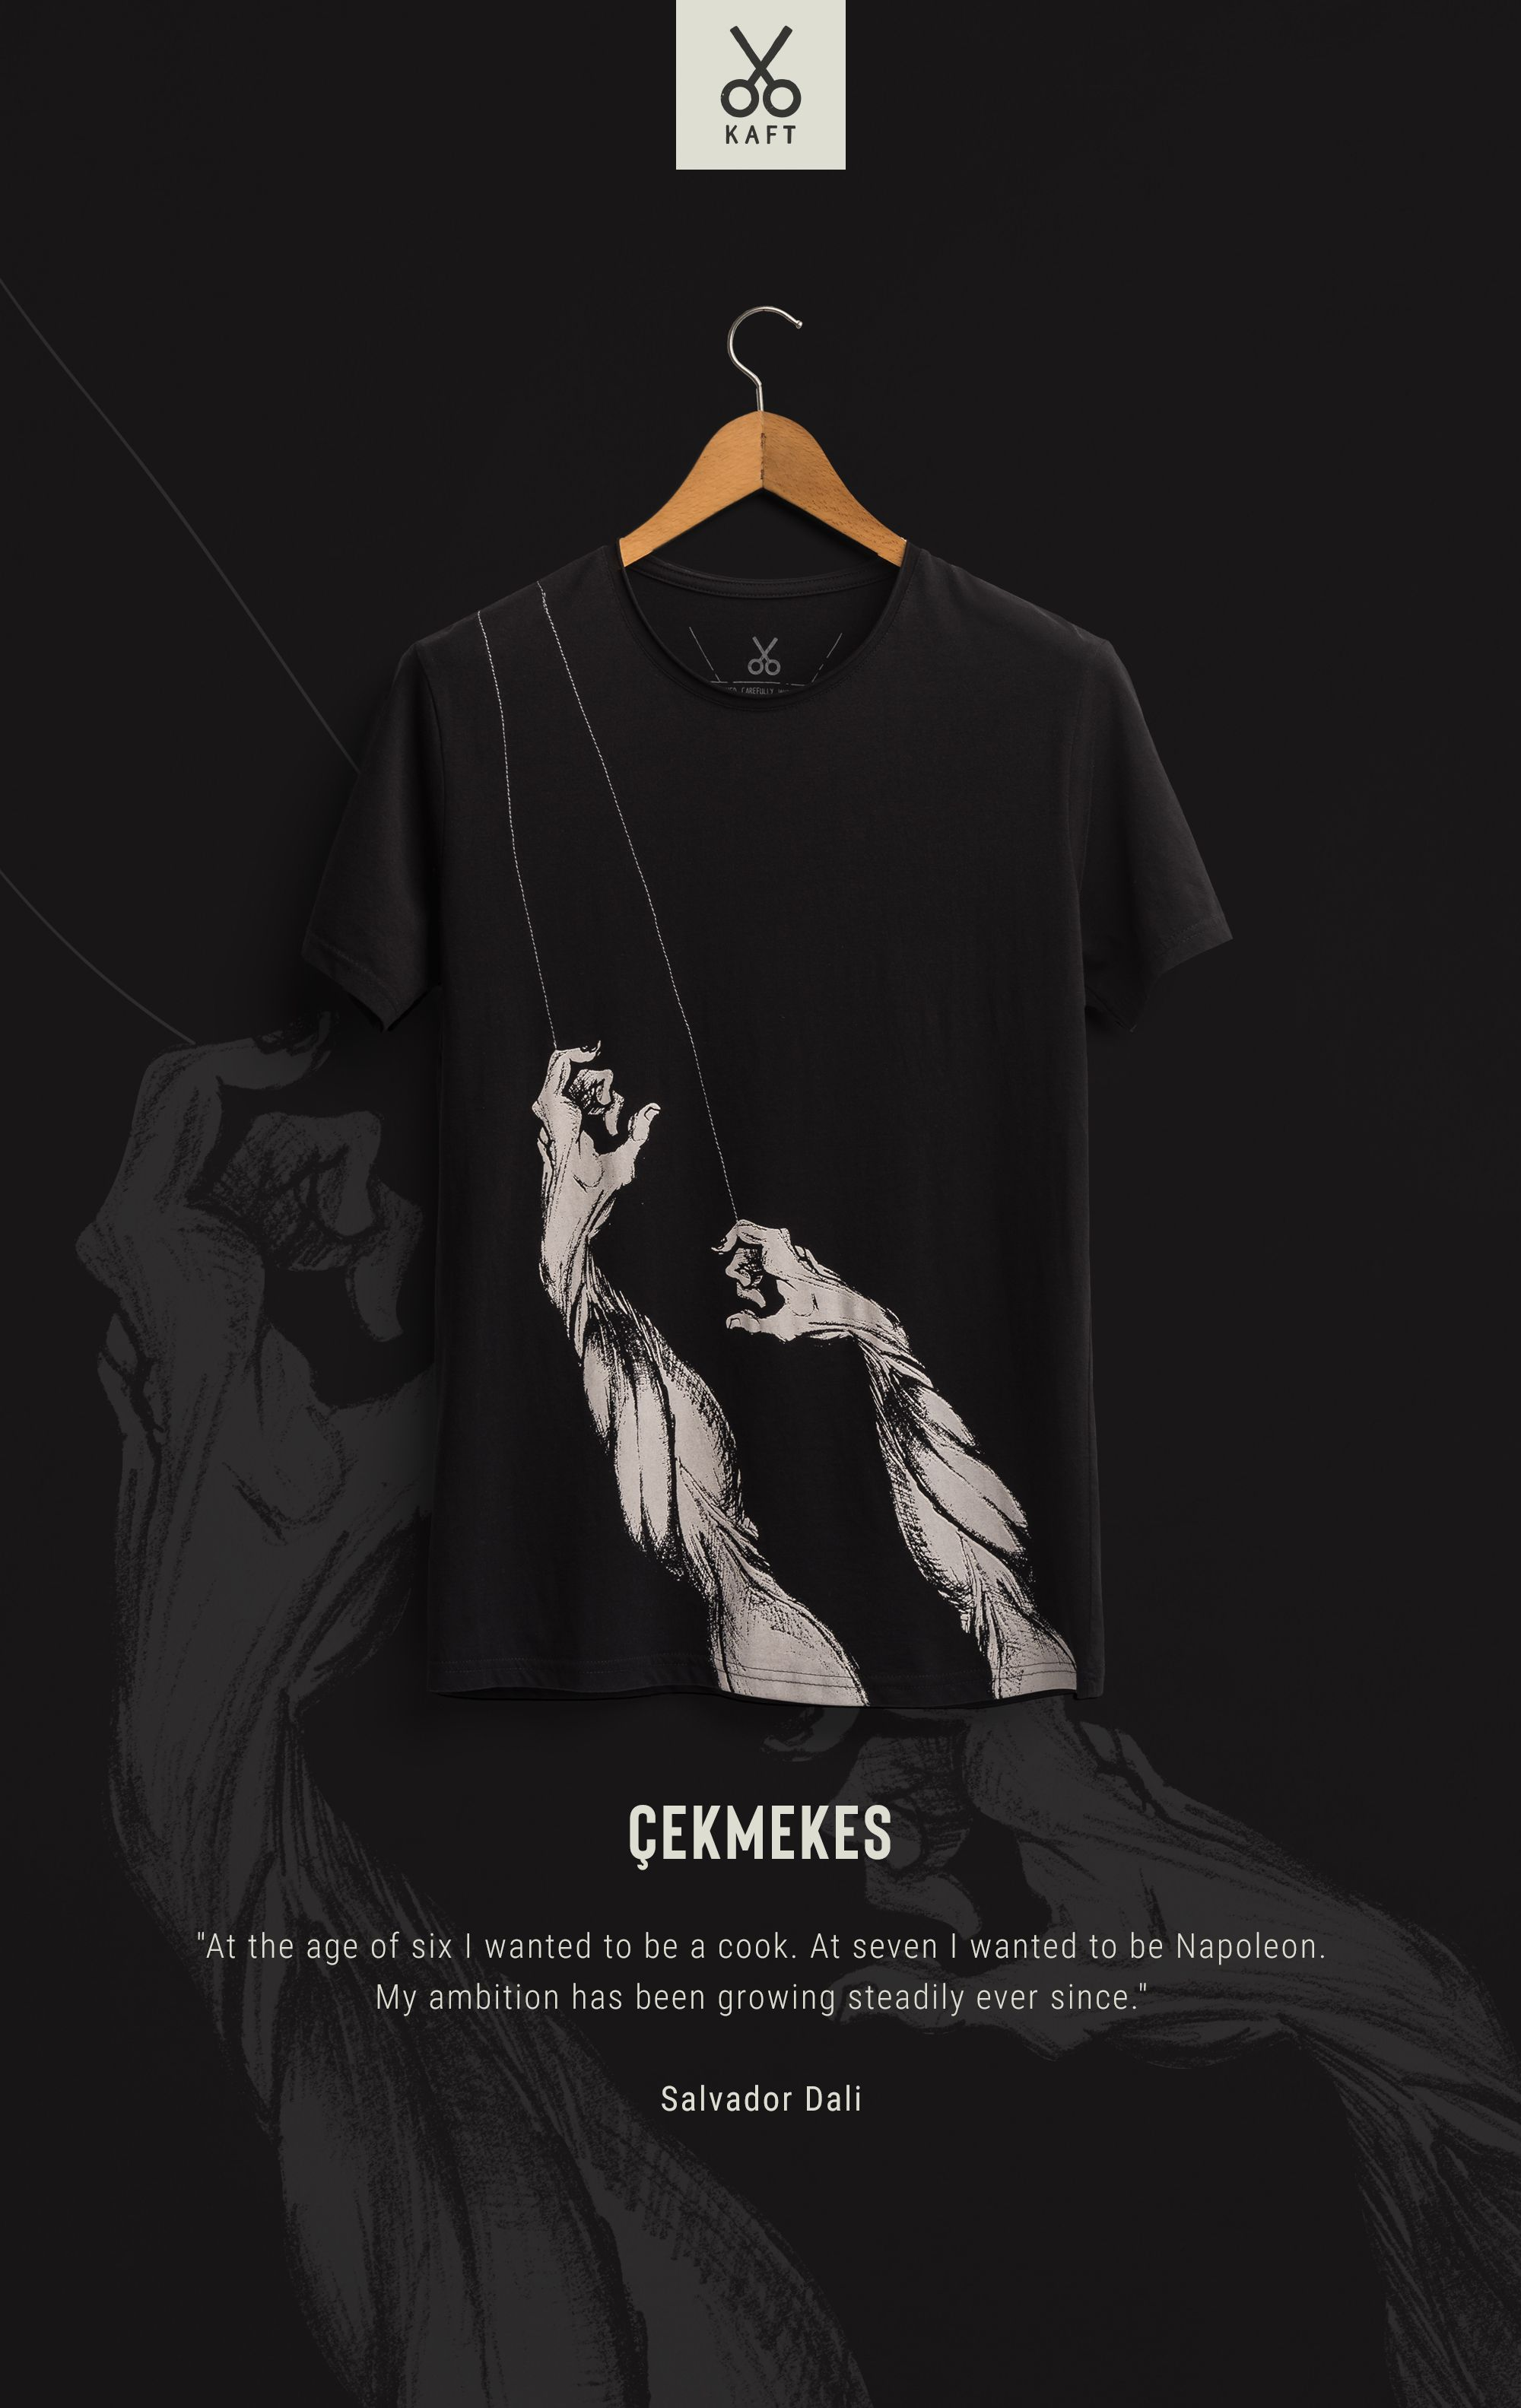 Cekmekes Os Tshirt 2020 Tisort